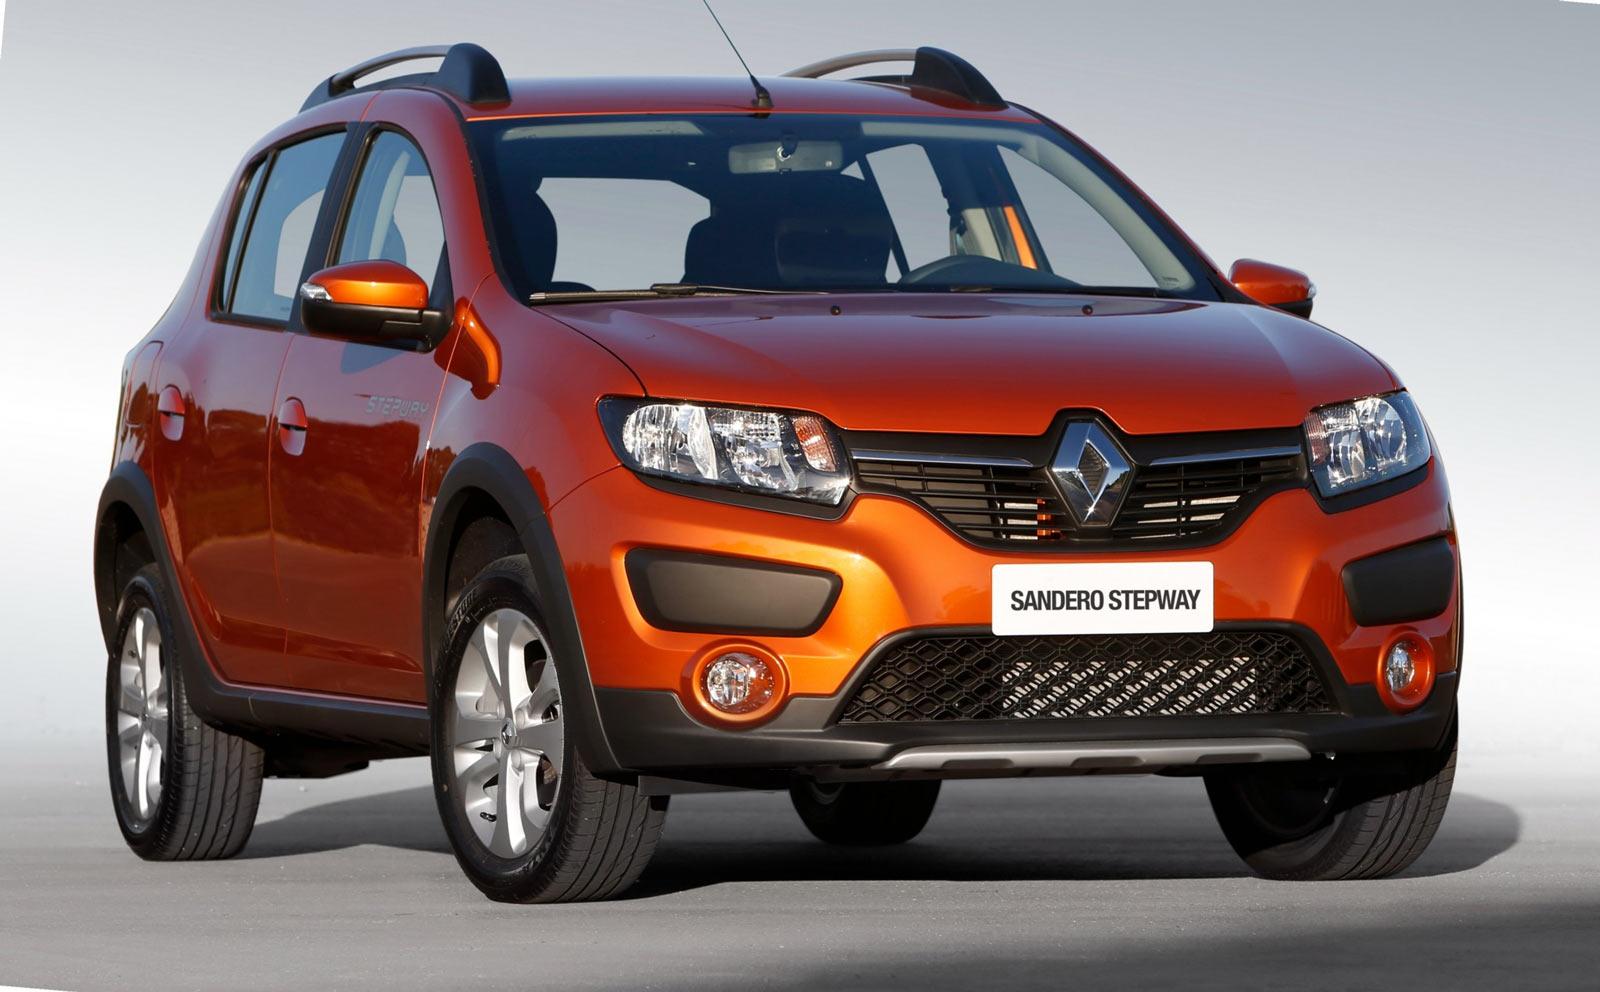 Renault SANDERO Stepway (Рено Сандеро Степвей 2017 в новом кузове)